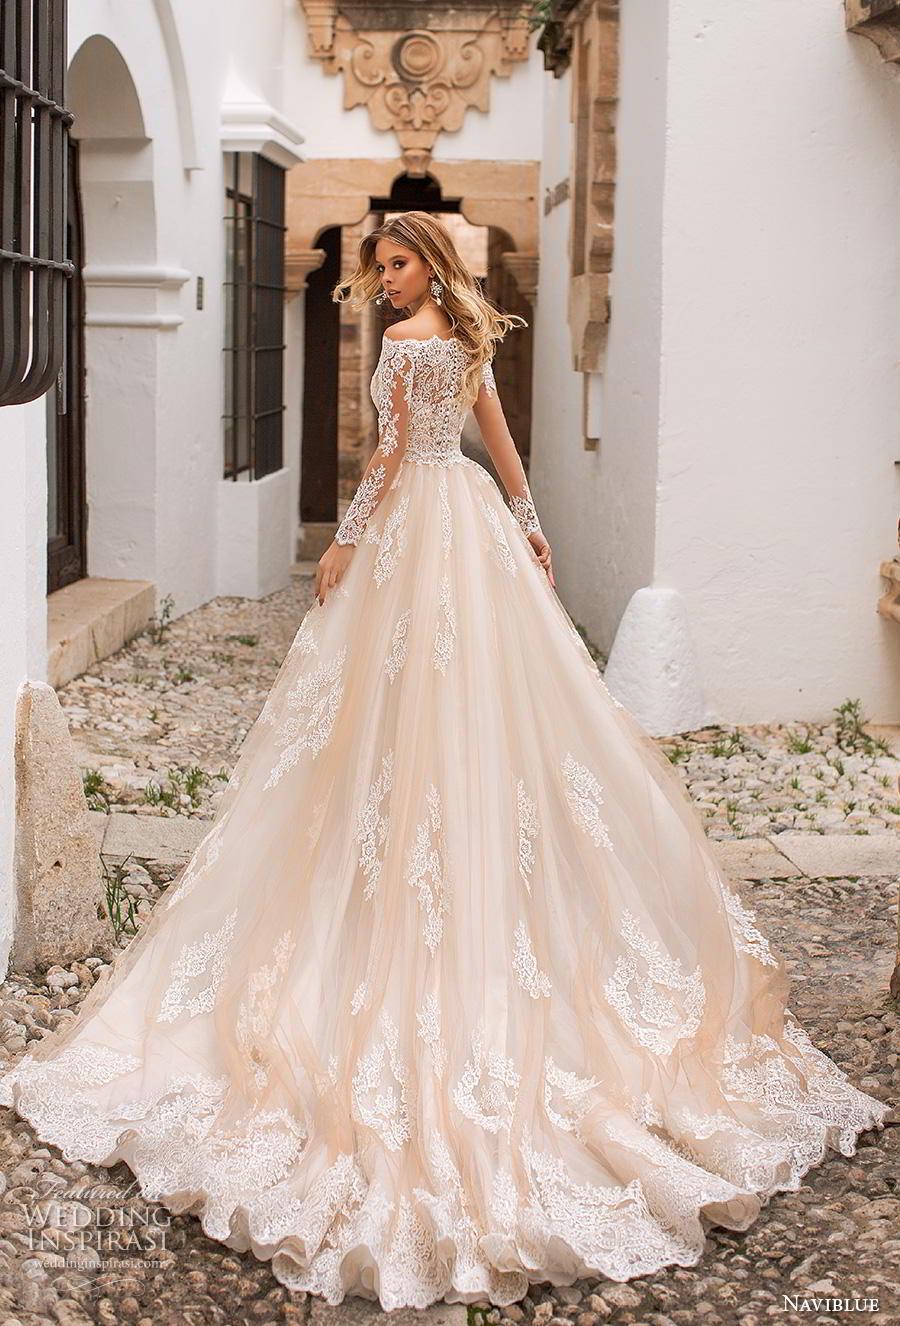 naviblue 2019 bridal long sleeves bateau neck full embellishment drop waist champagne a line wedding dress lace back chapel train (5) bv